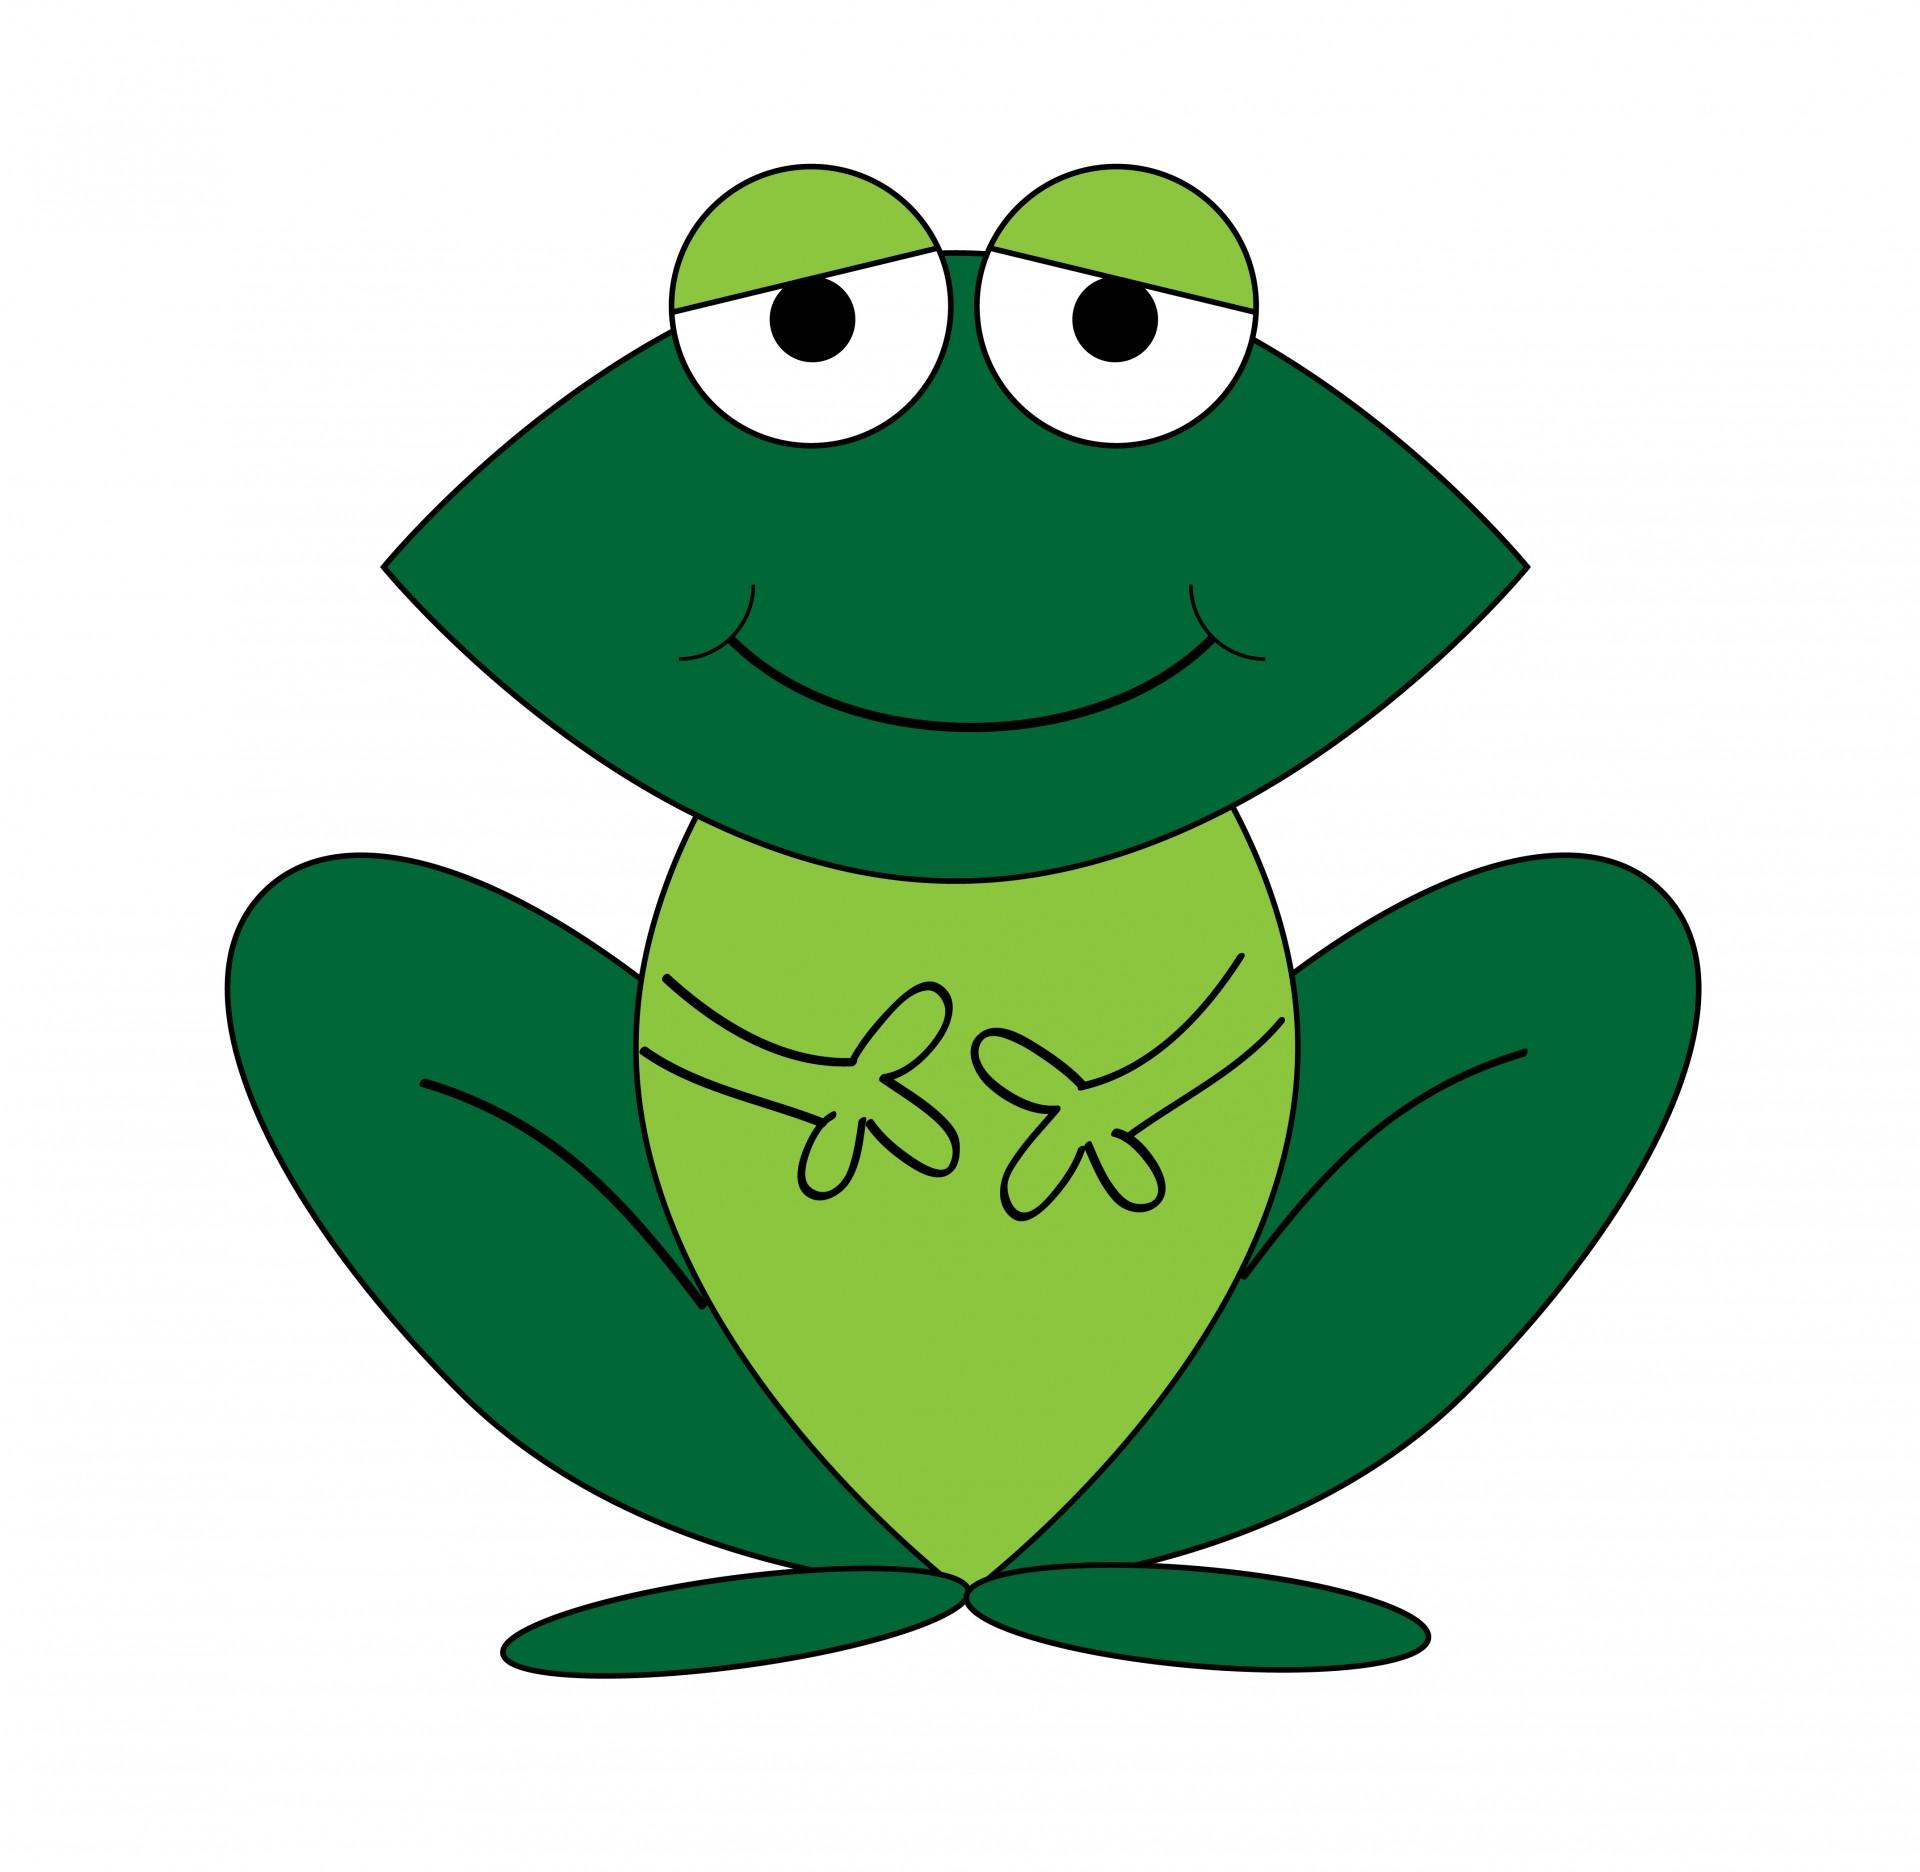 Rainforest clipart frog. Free download best